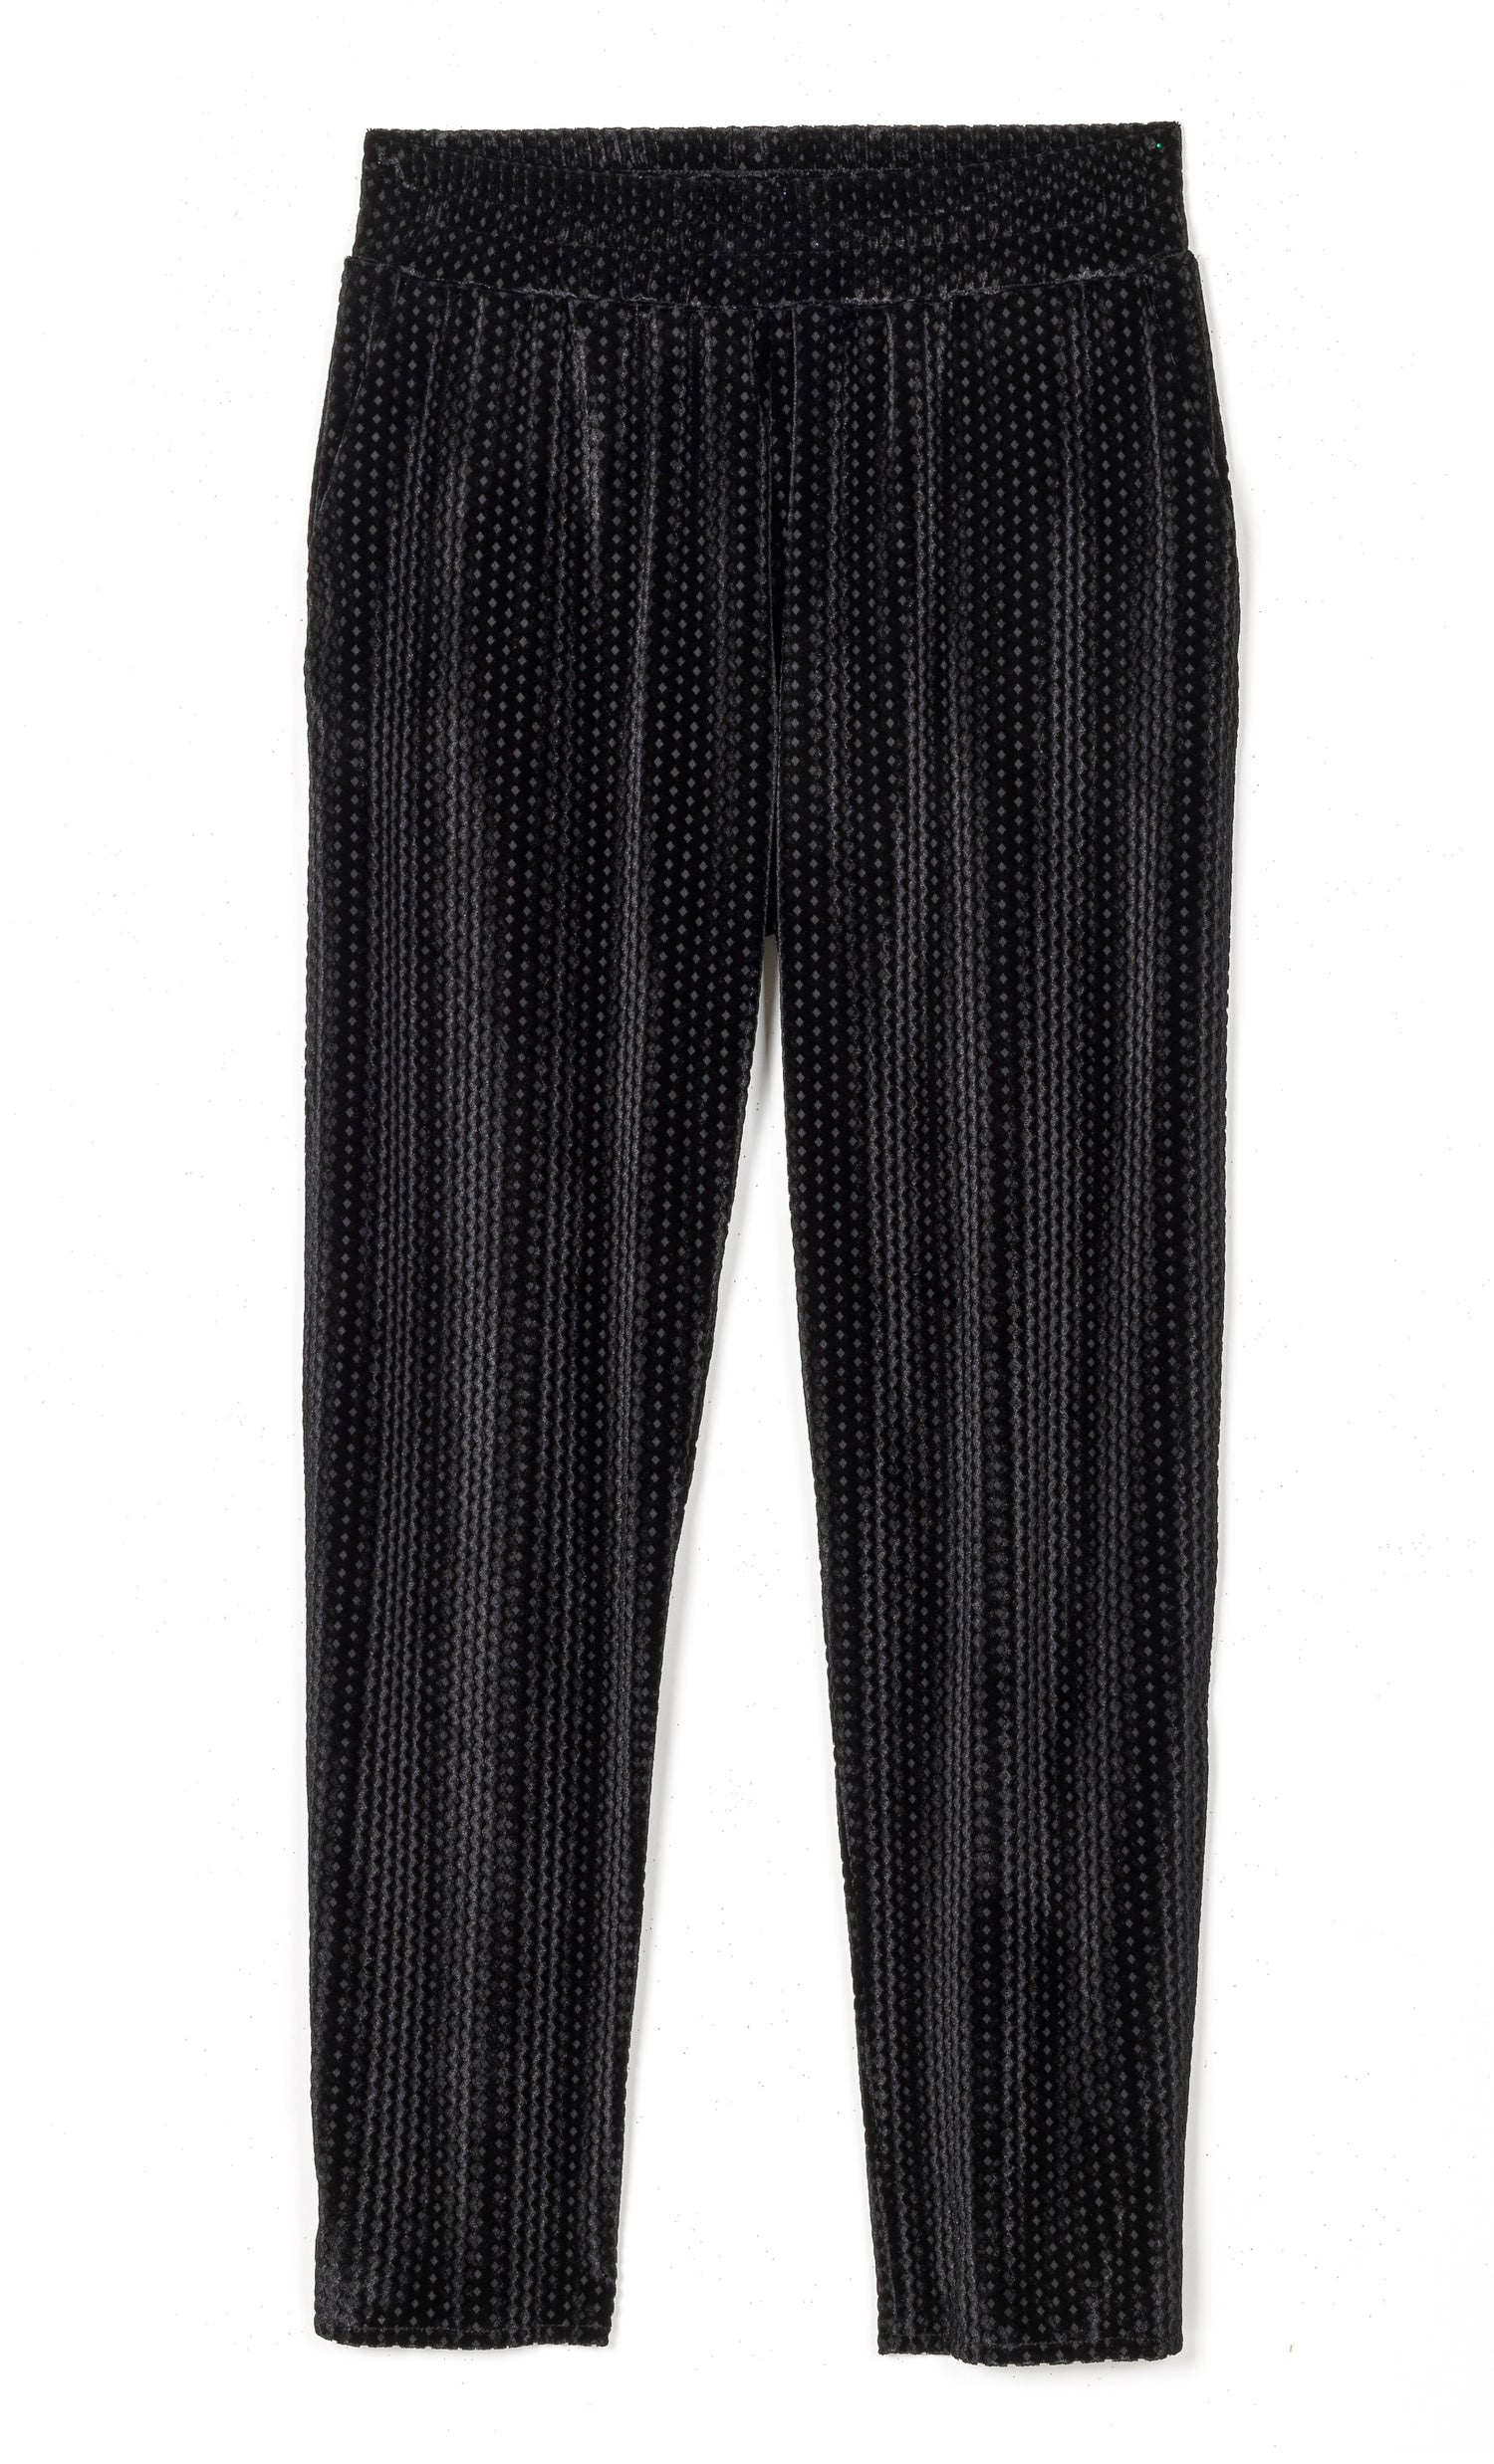 Image of Pantalon velours jacquard MAURICETTE 85€ -60%